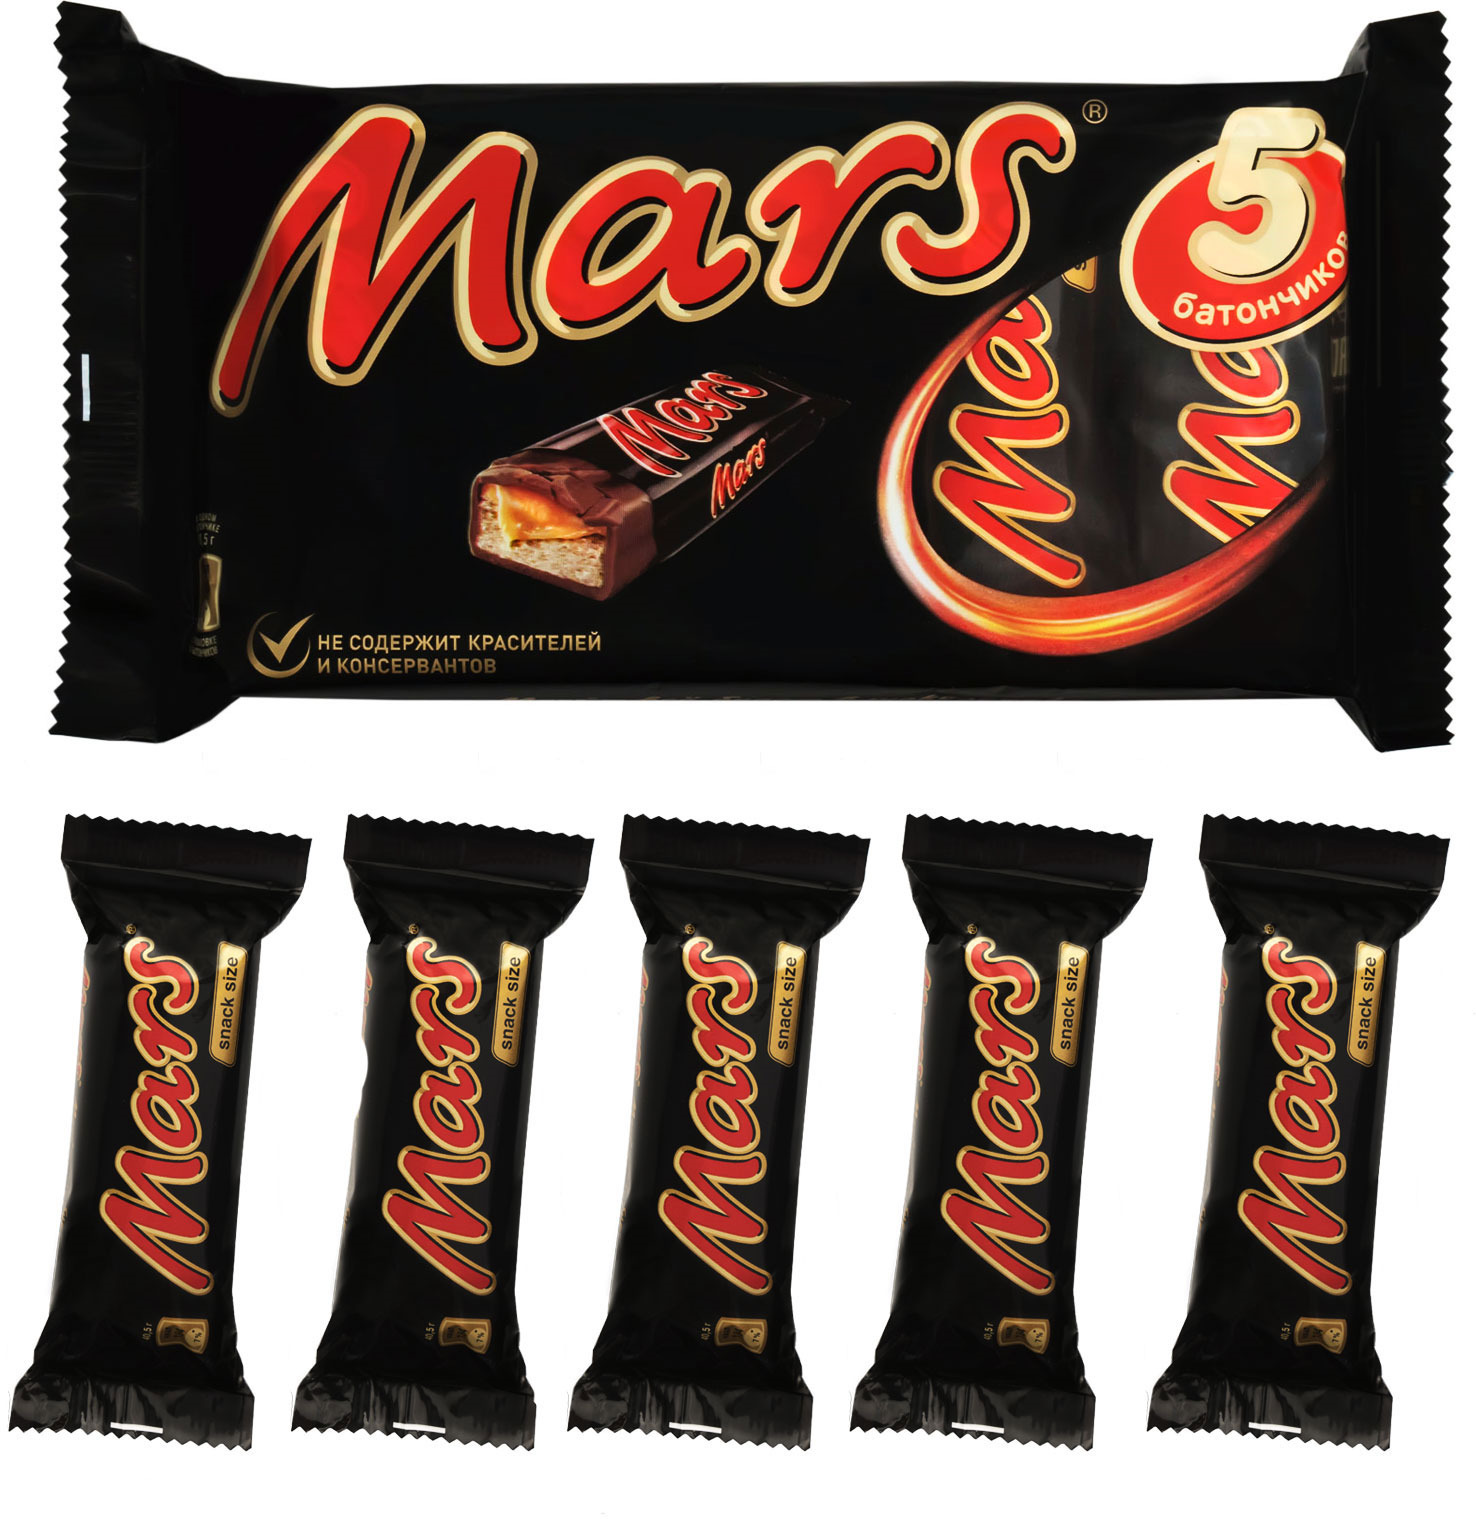 Марс шоколадный батончик картинки